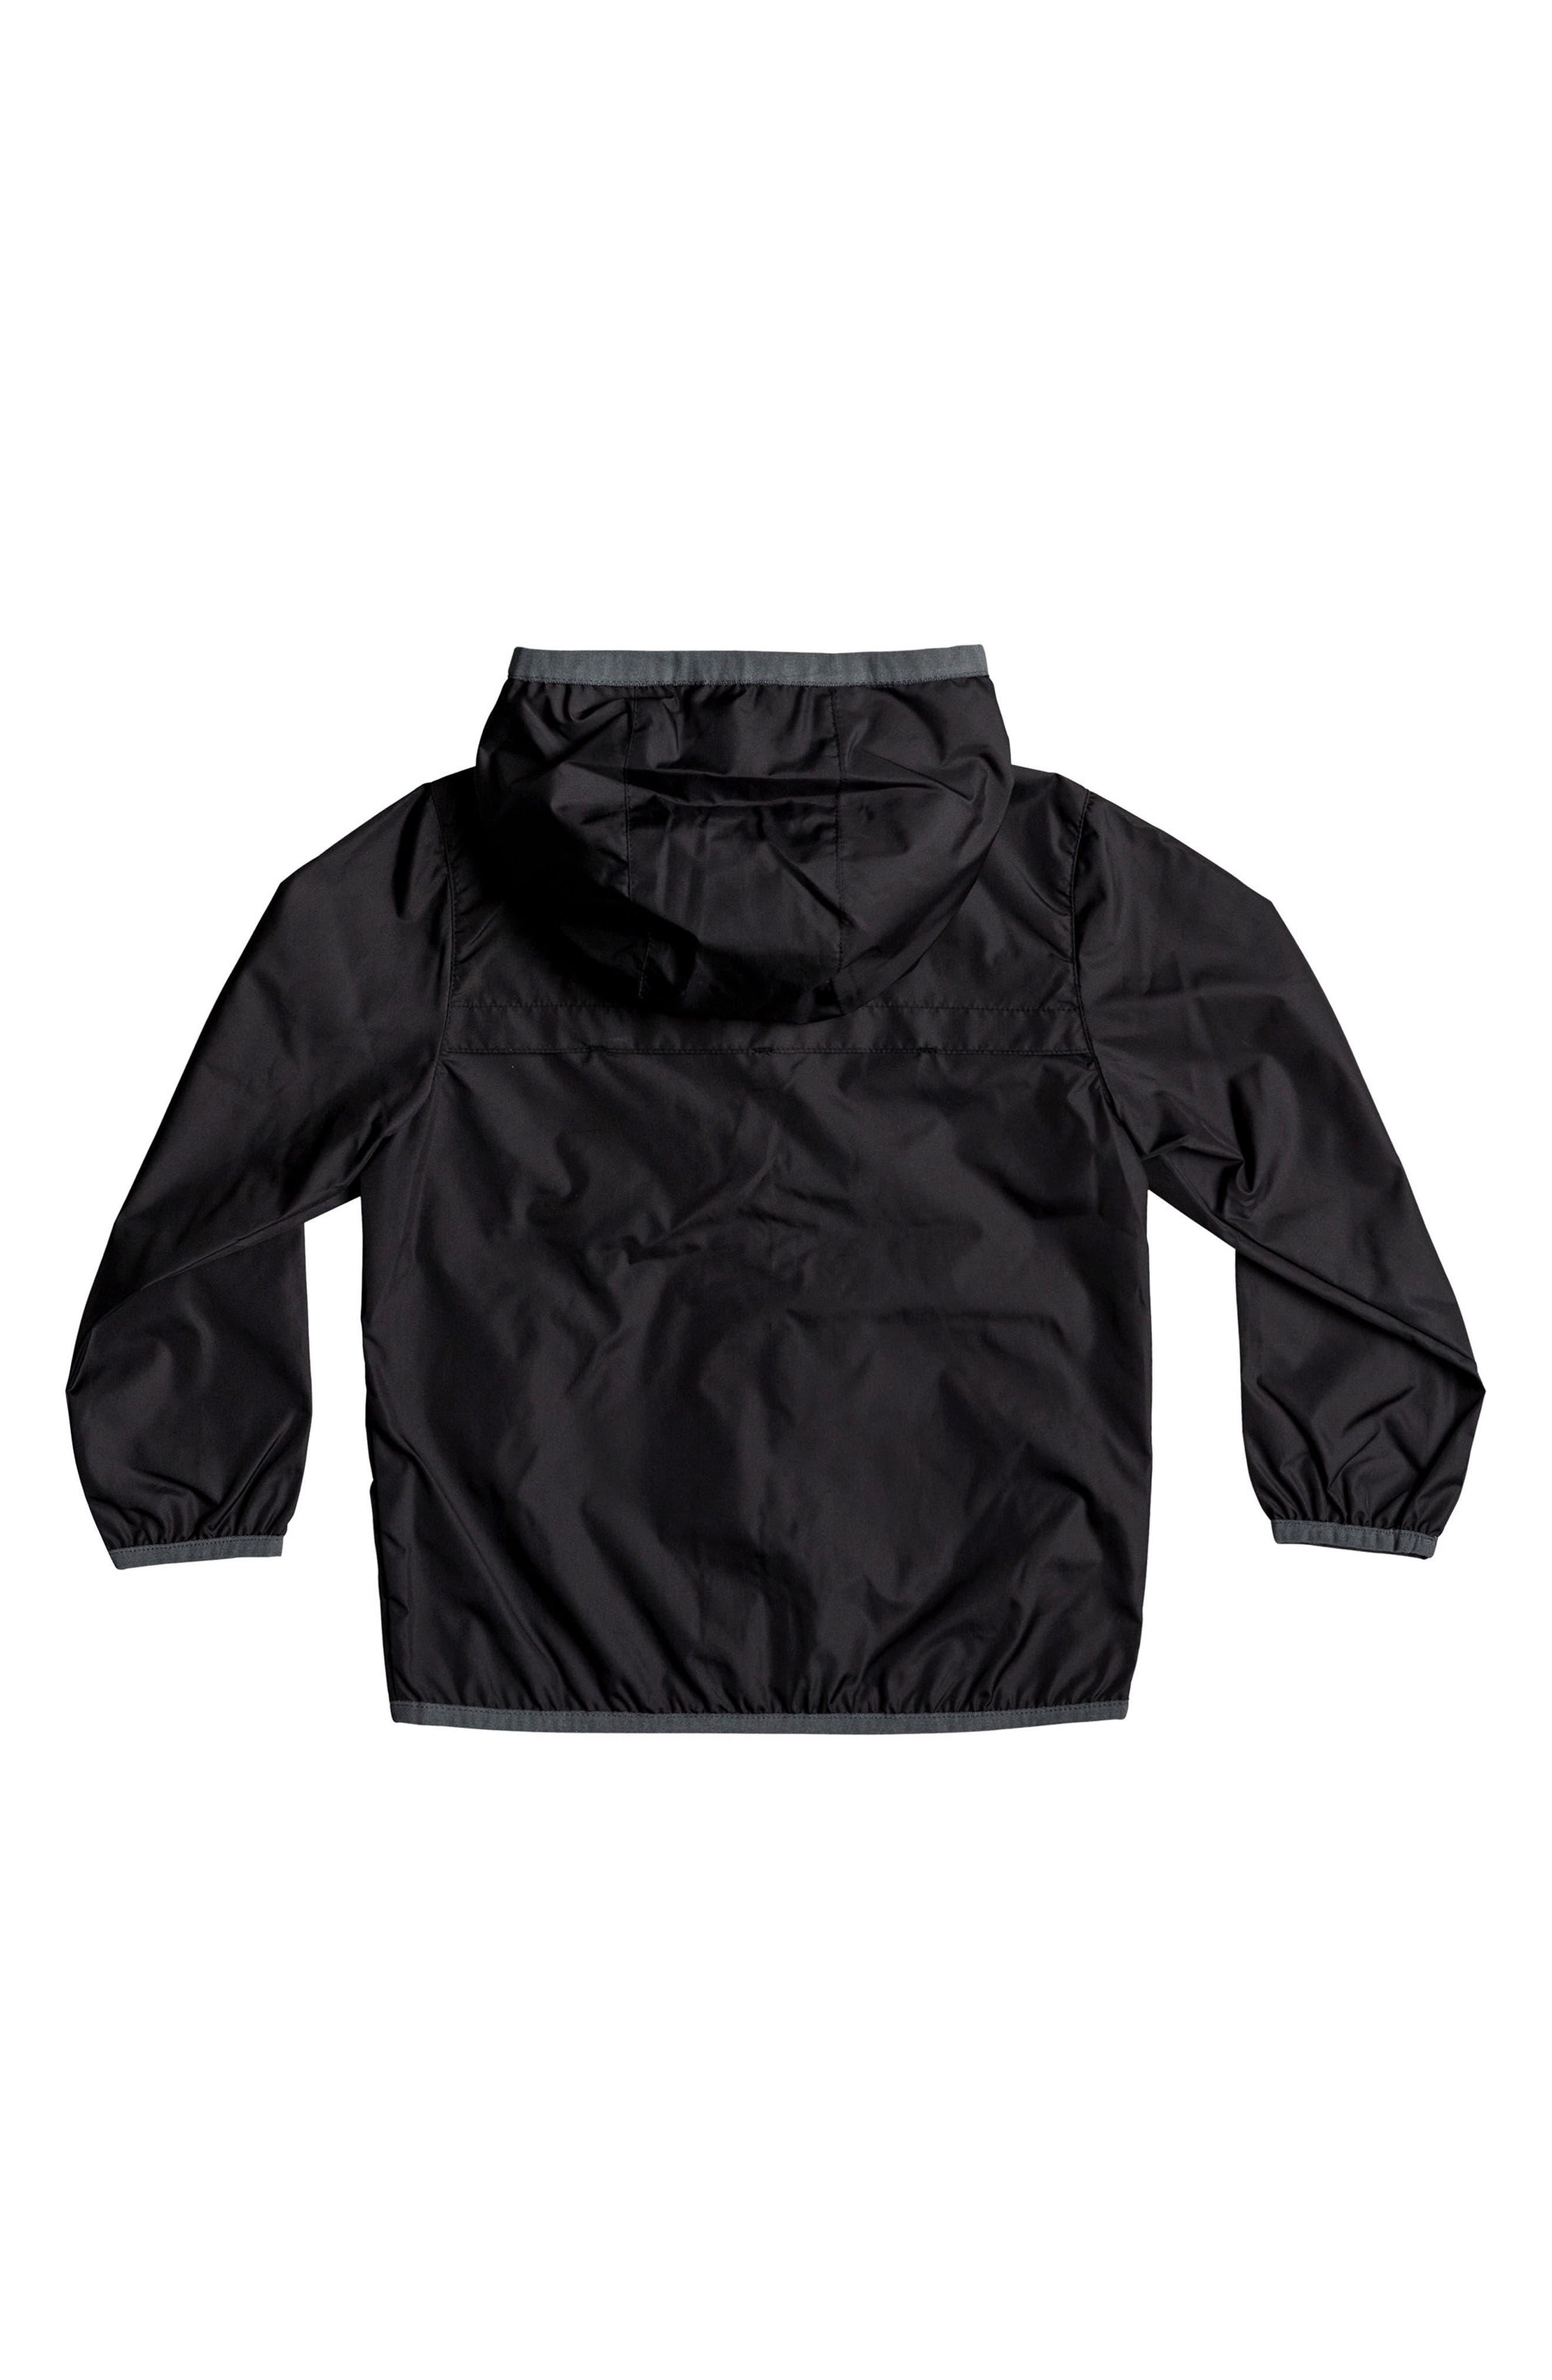 Alternate Image 2  - Quiksilver Hooded Jacket (Toddler Boys & Little Boys)